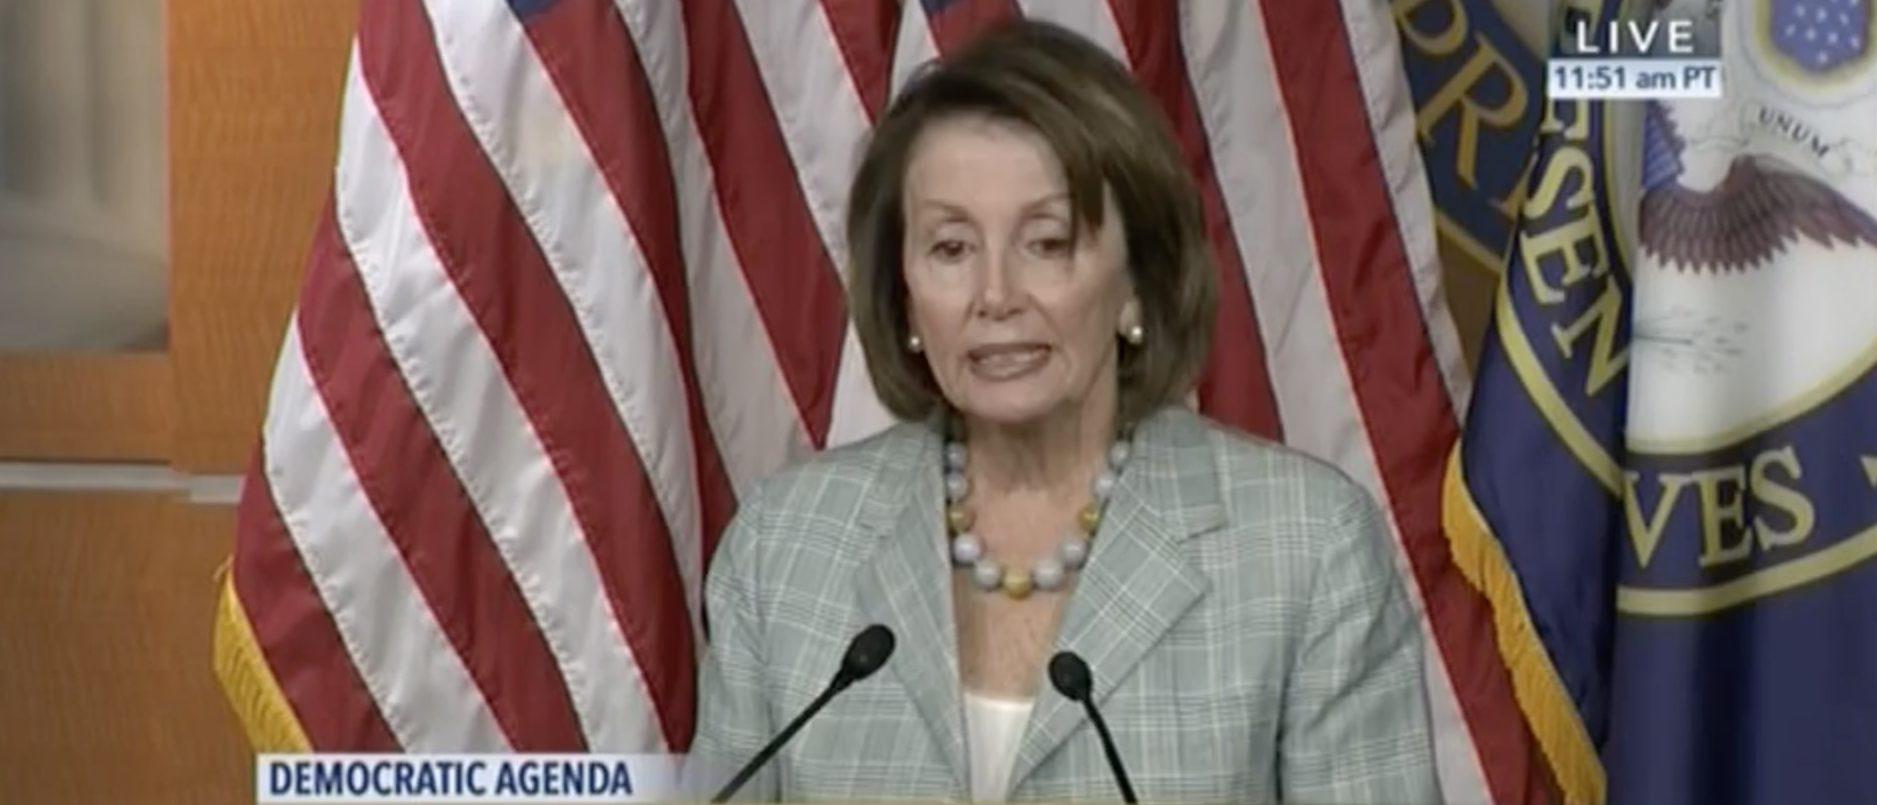 Nancy Pelosi, Screen Grab CSPAN, 6-23-2016